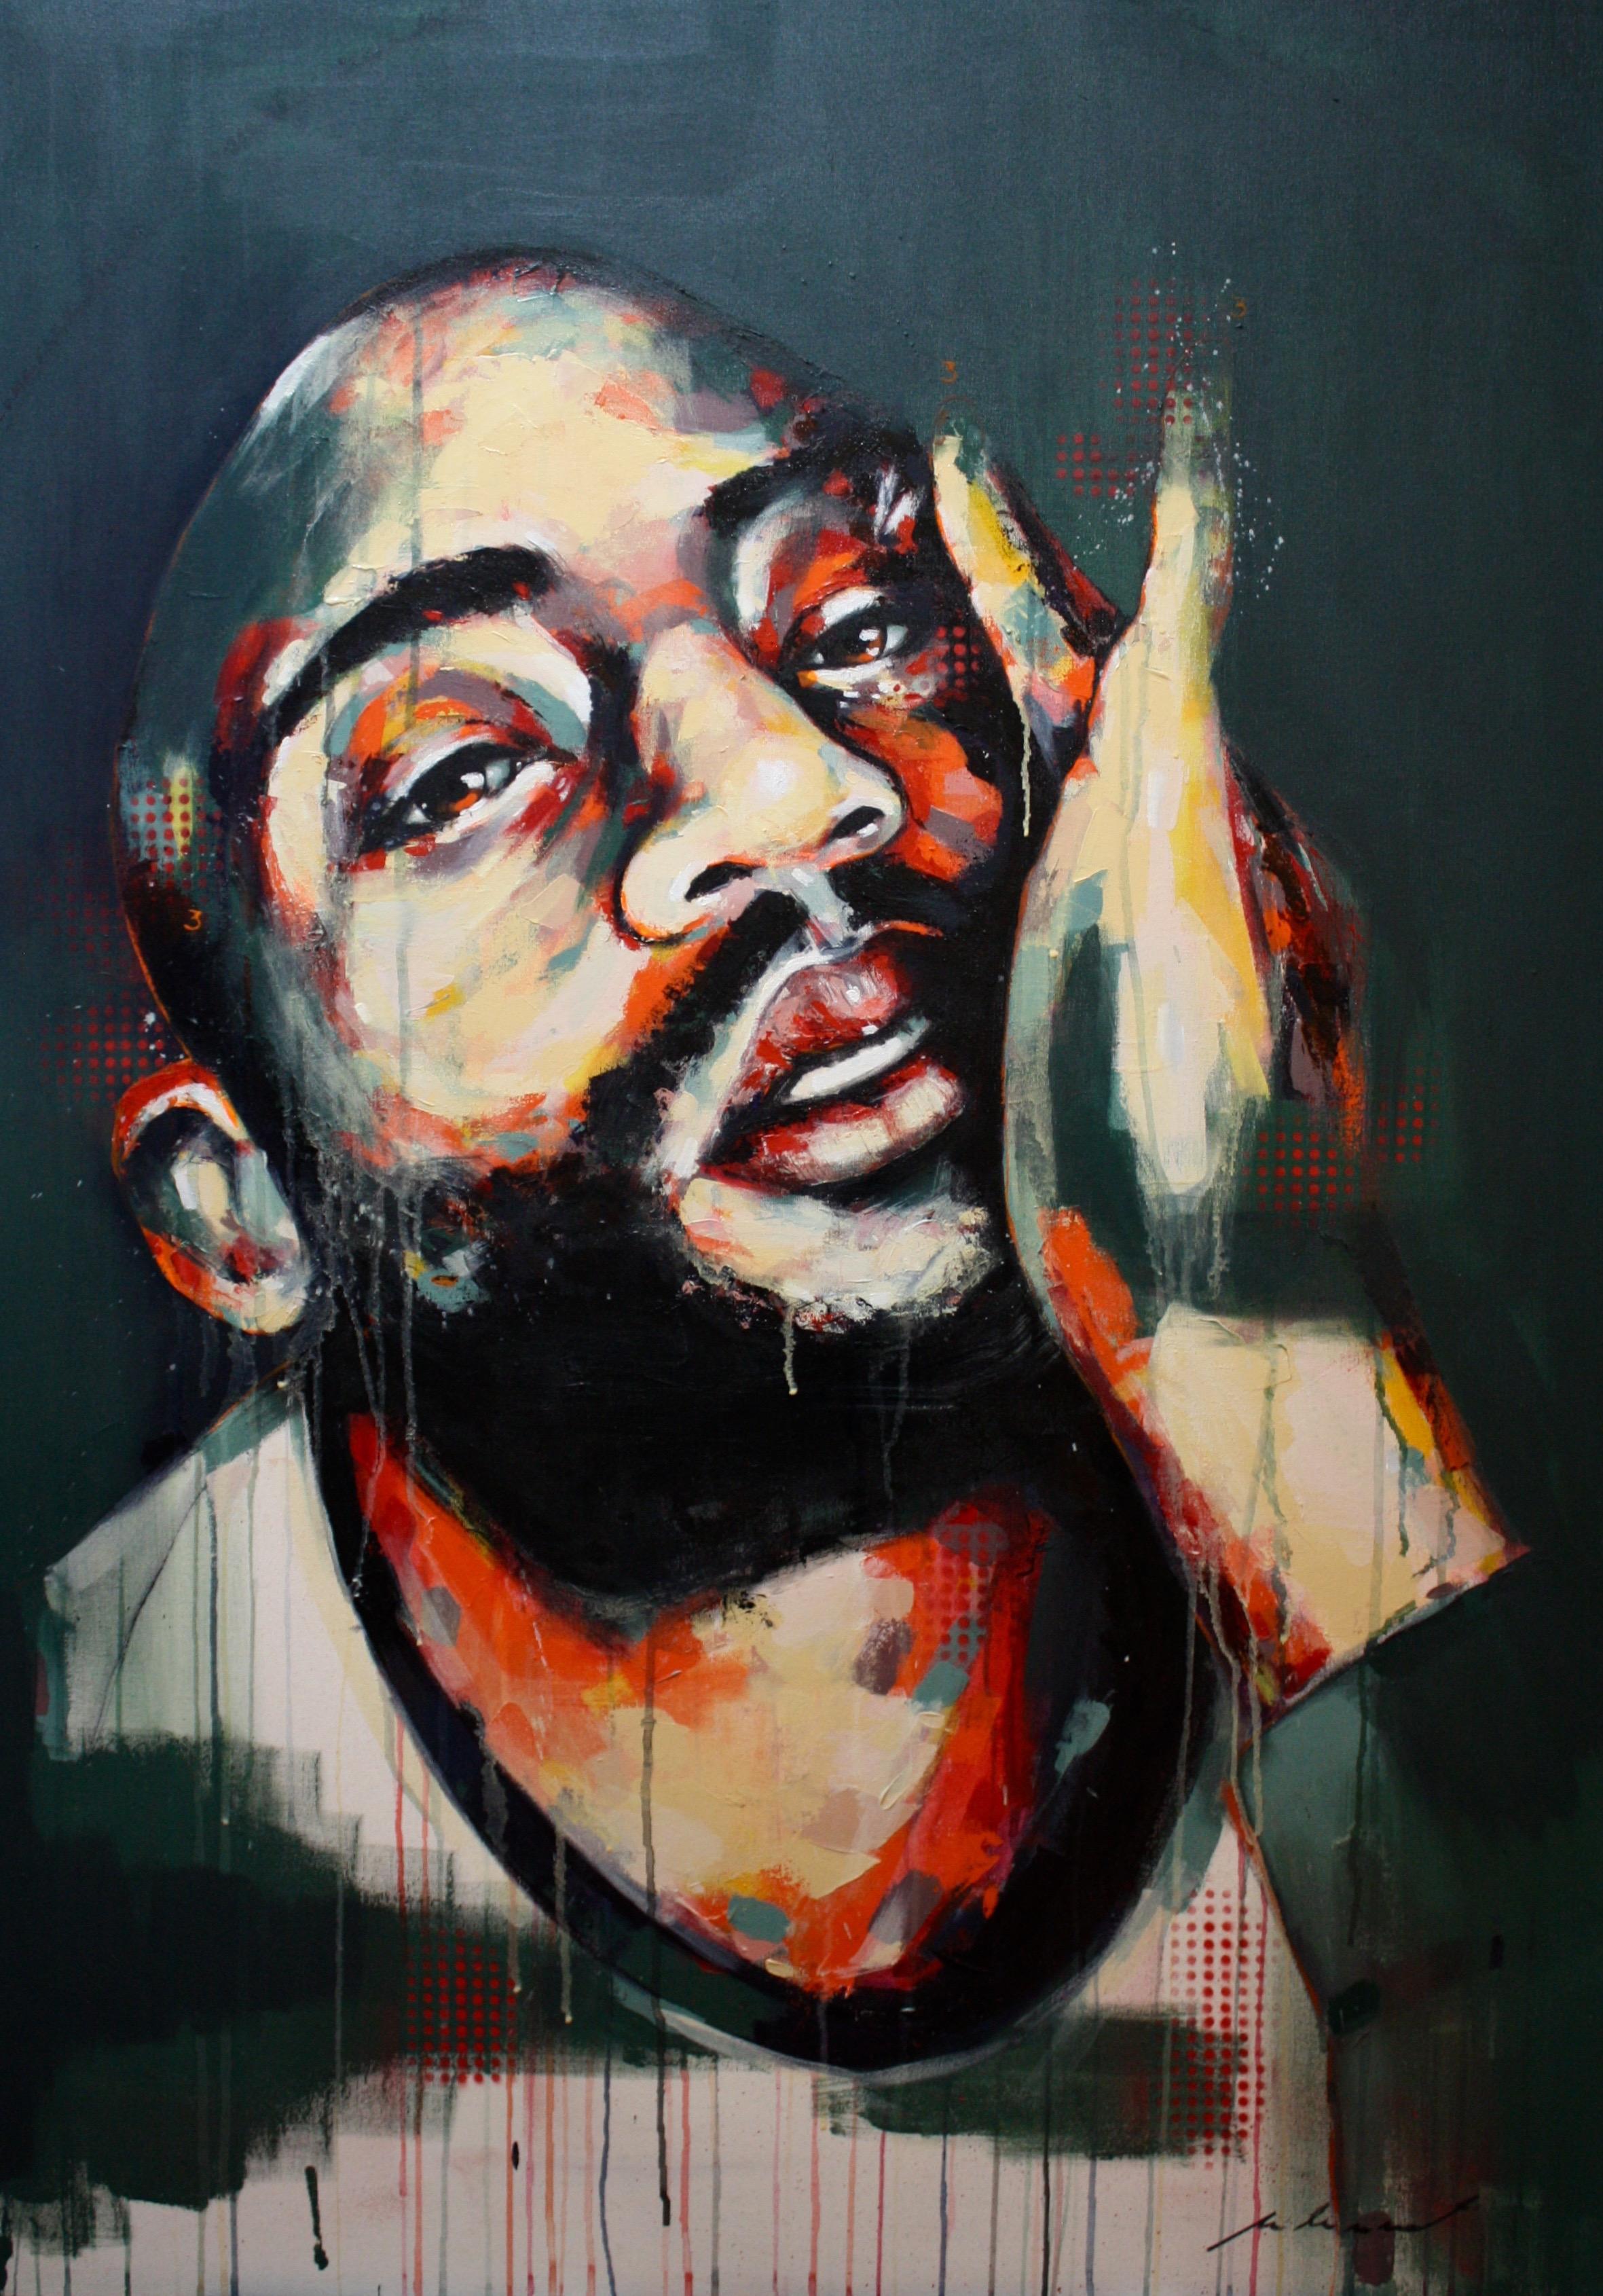 Jeremy, 2017 | Acrylic on Canvas | 90 x 130 cm